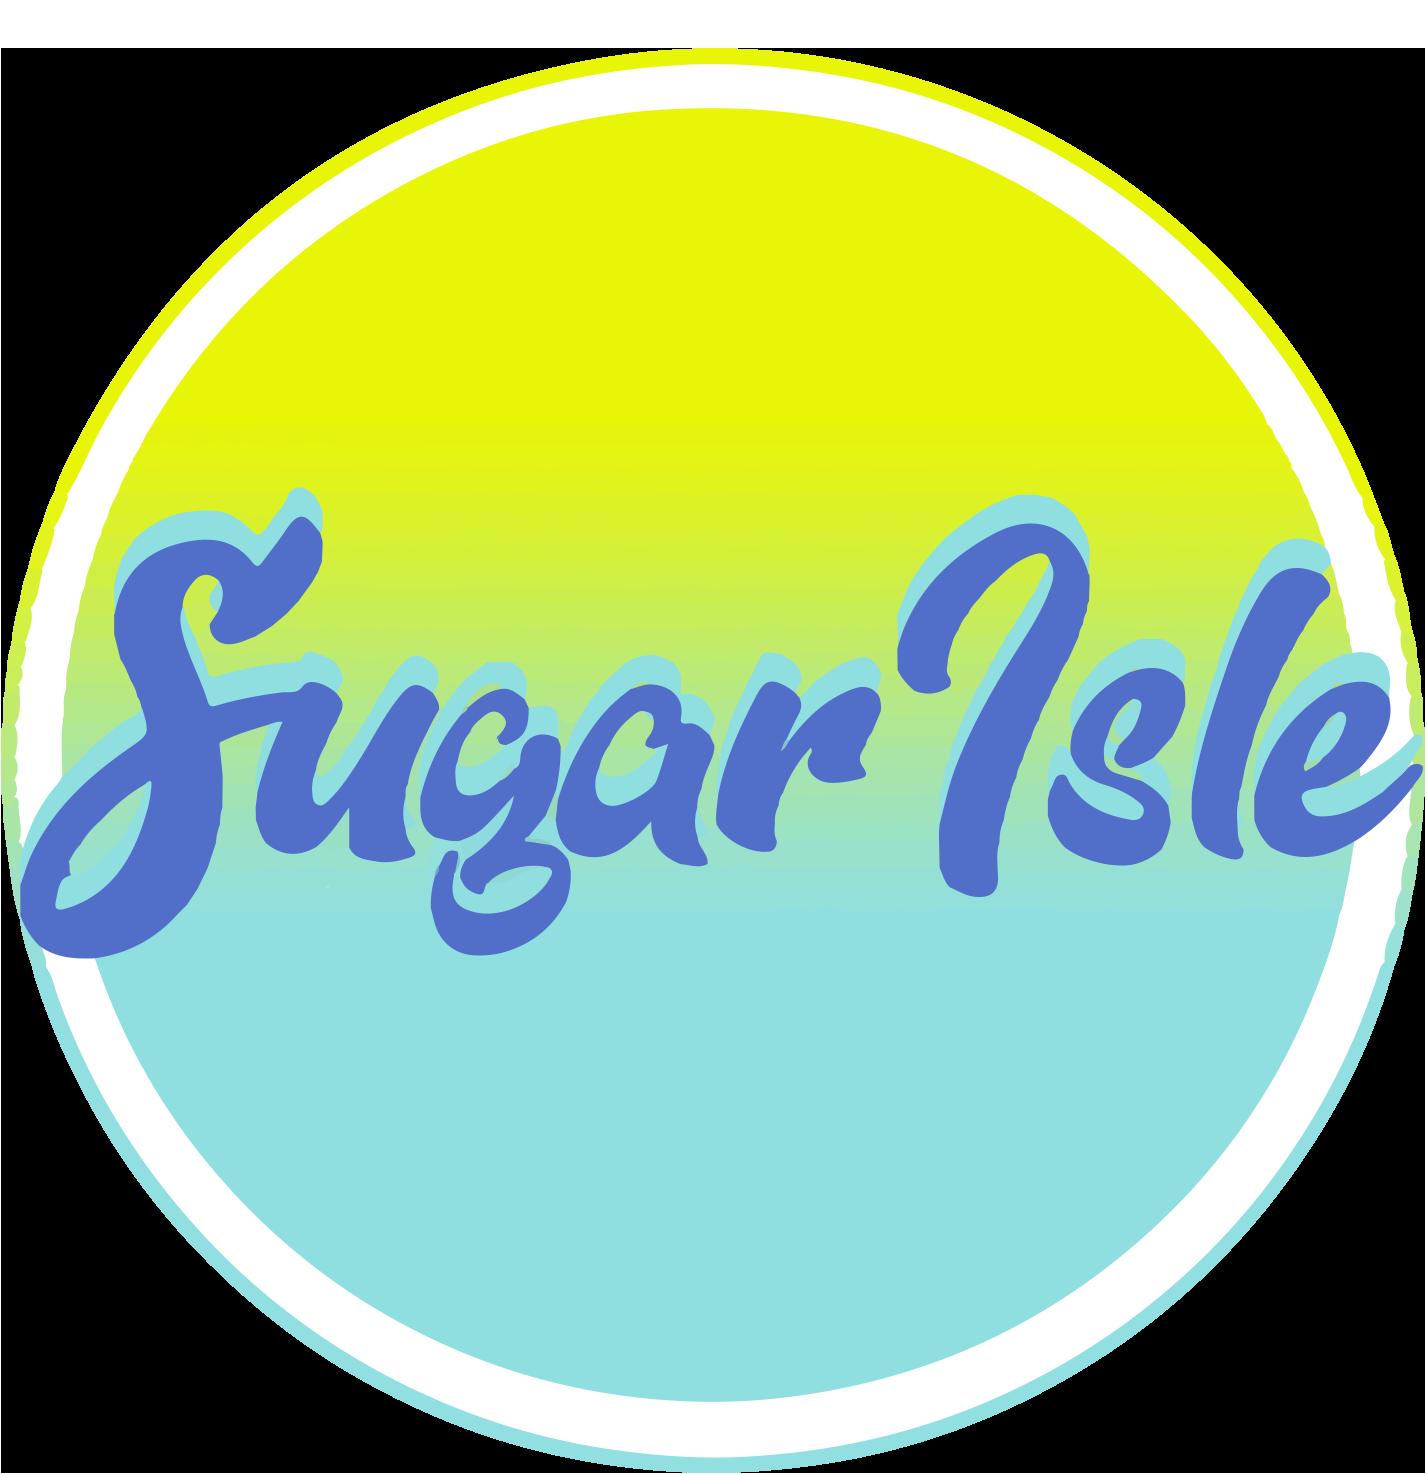 SugarIsleFinal.png